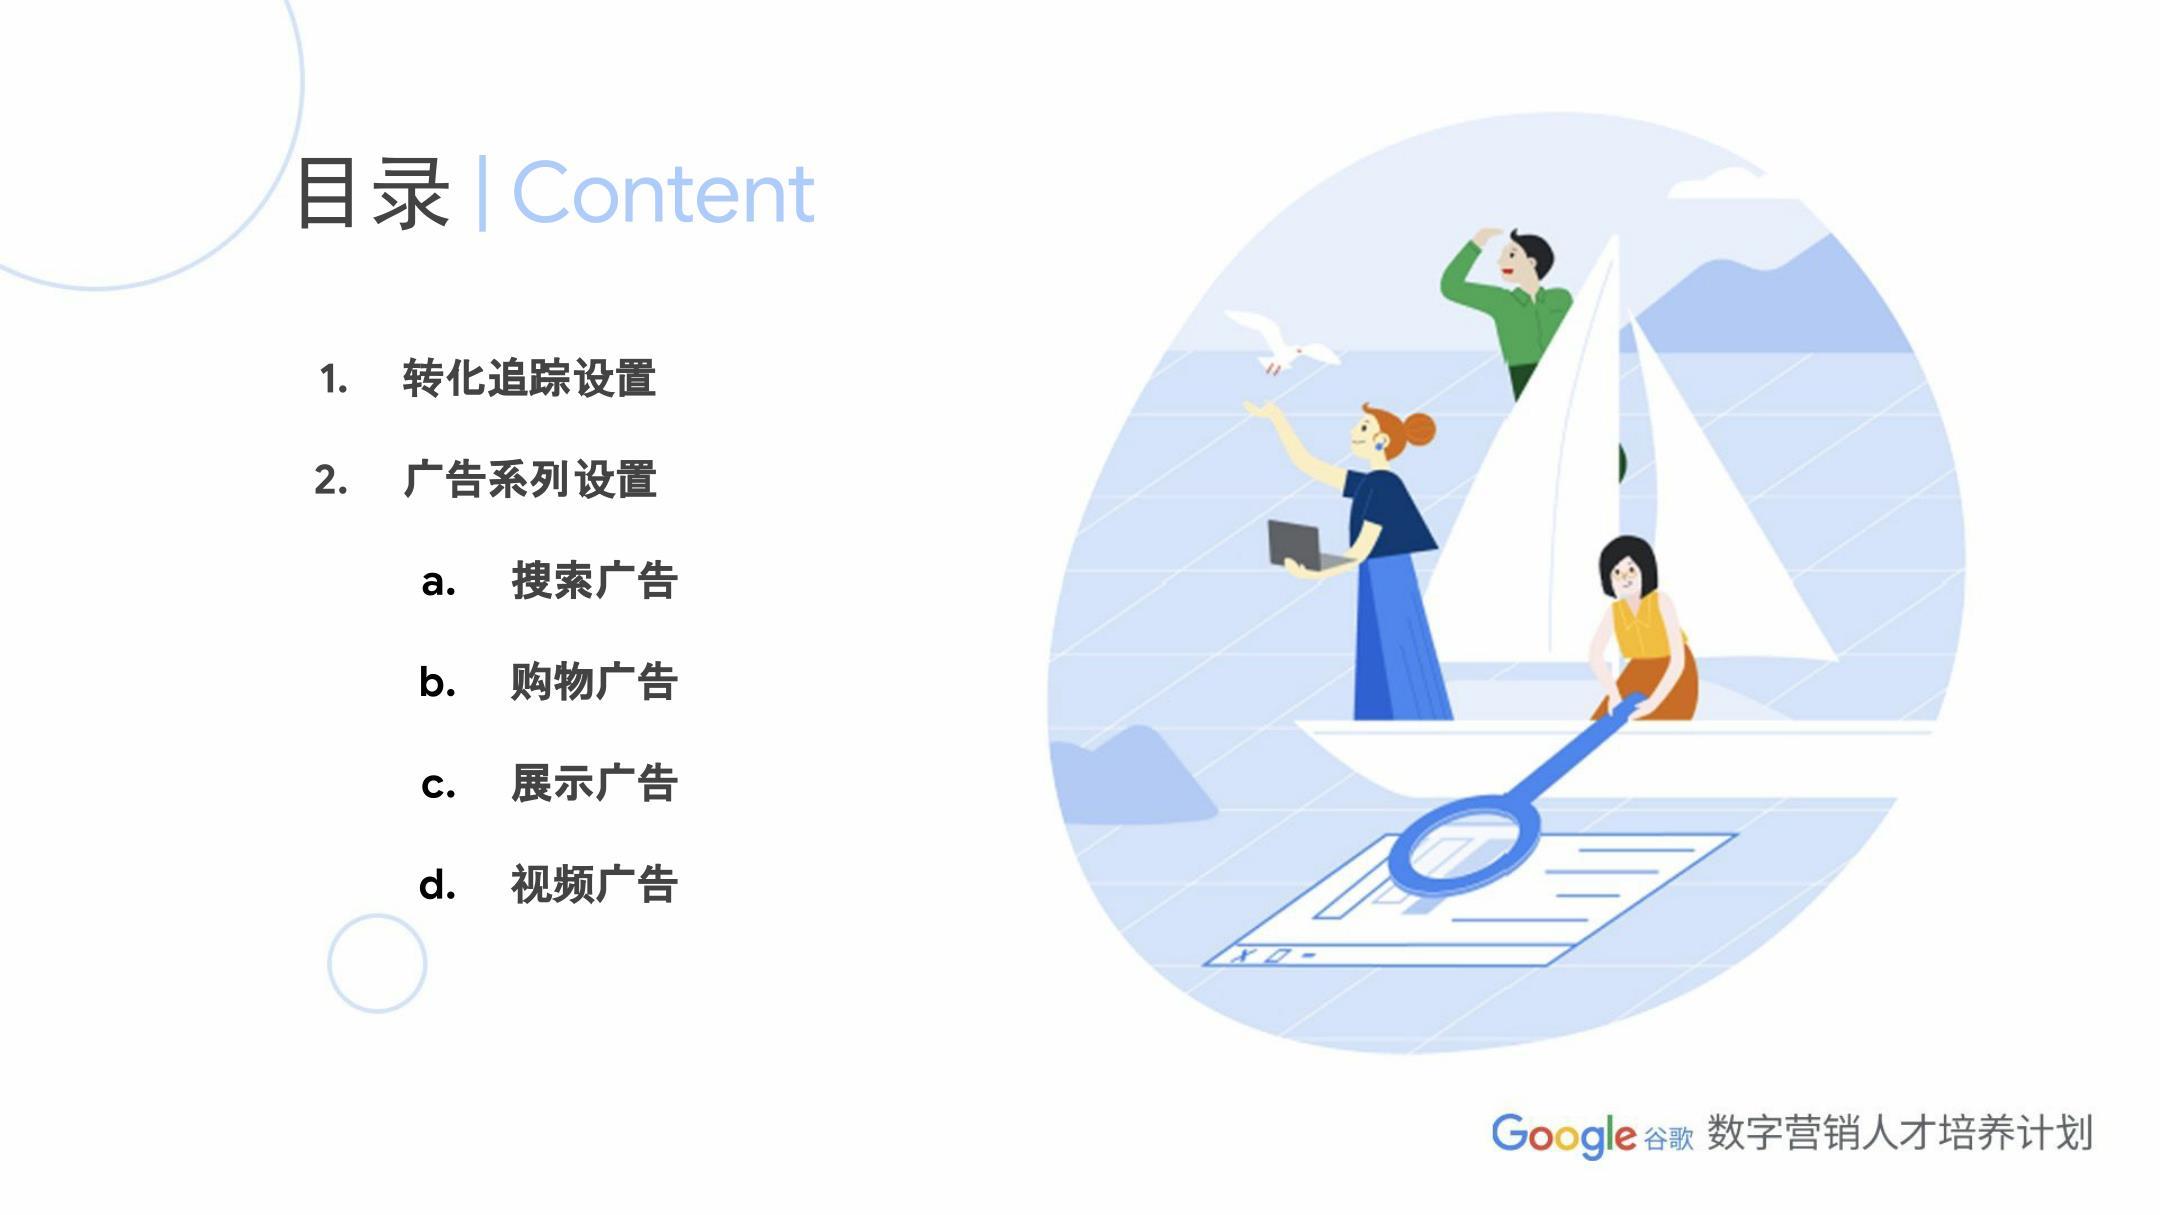 GOOGLE 数字营销直播课高级课程 - 谷歌广告投放